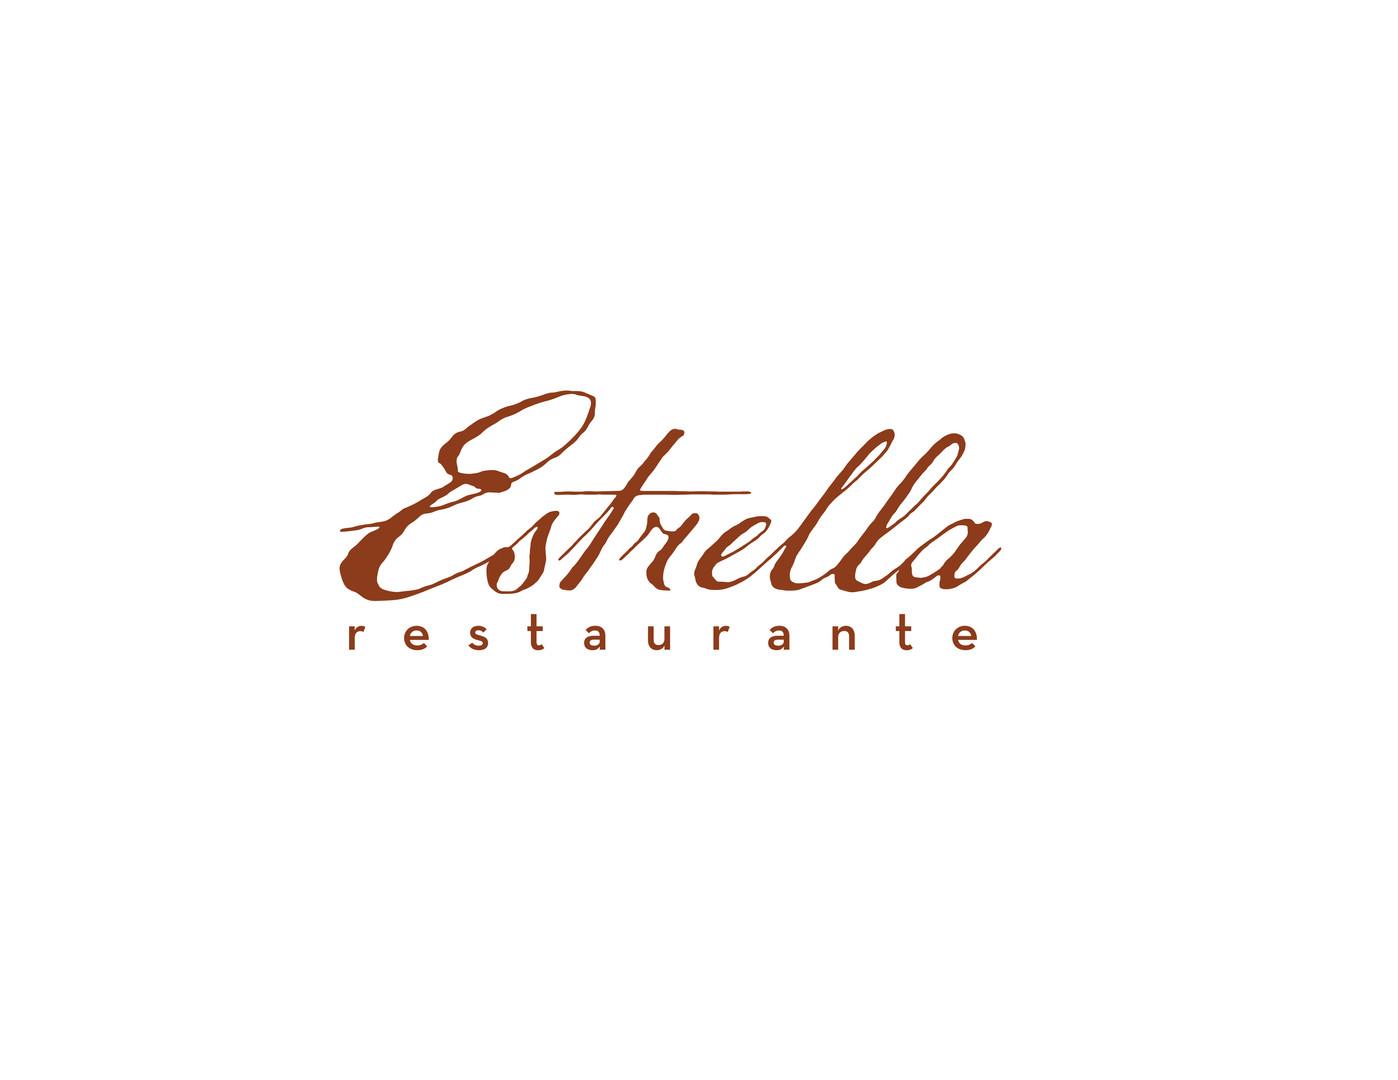 Estrella Restaurante